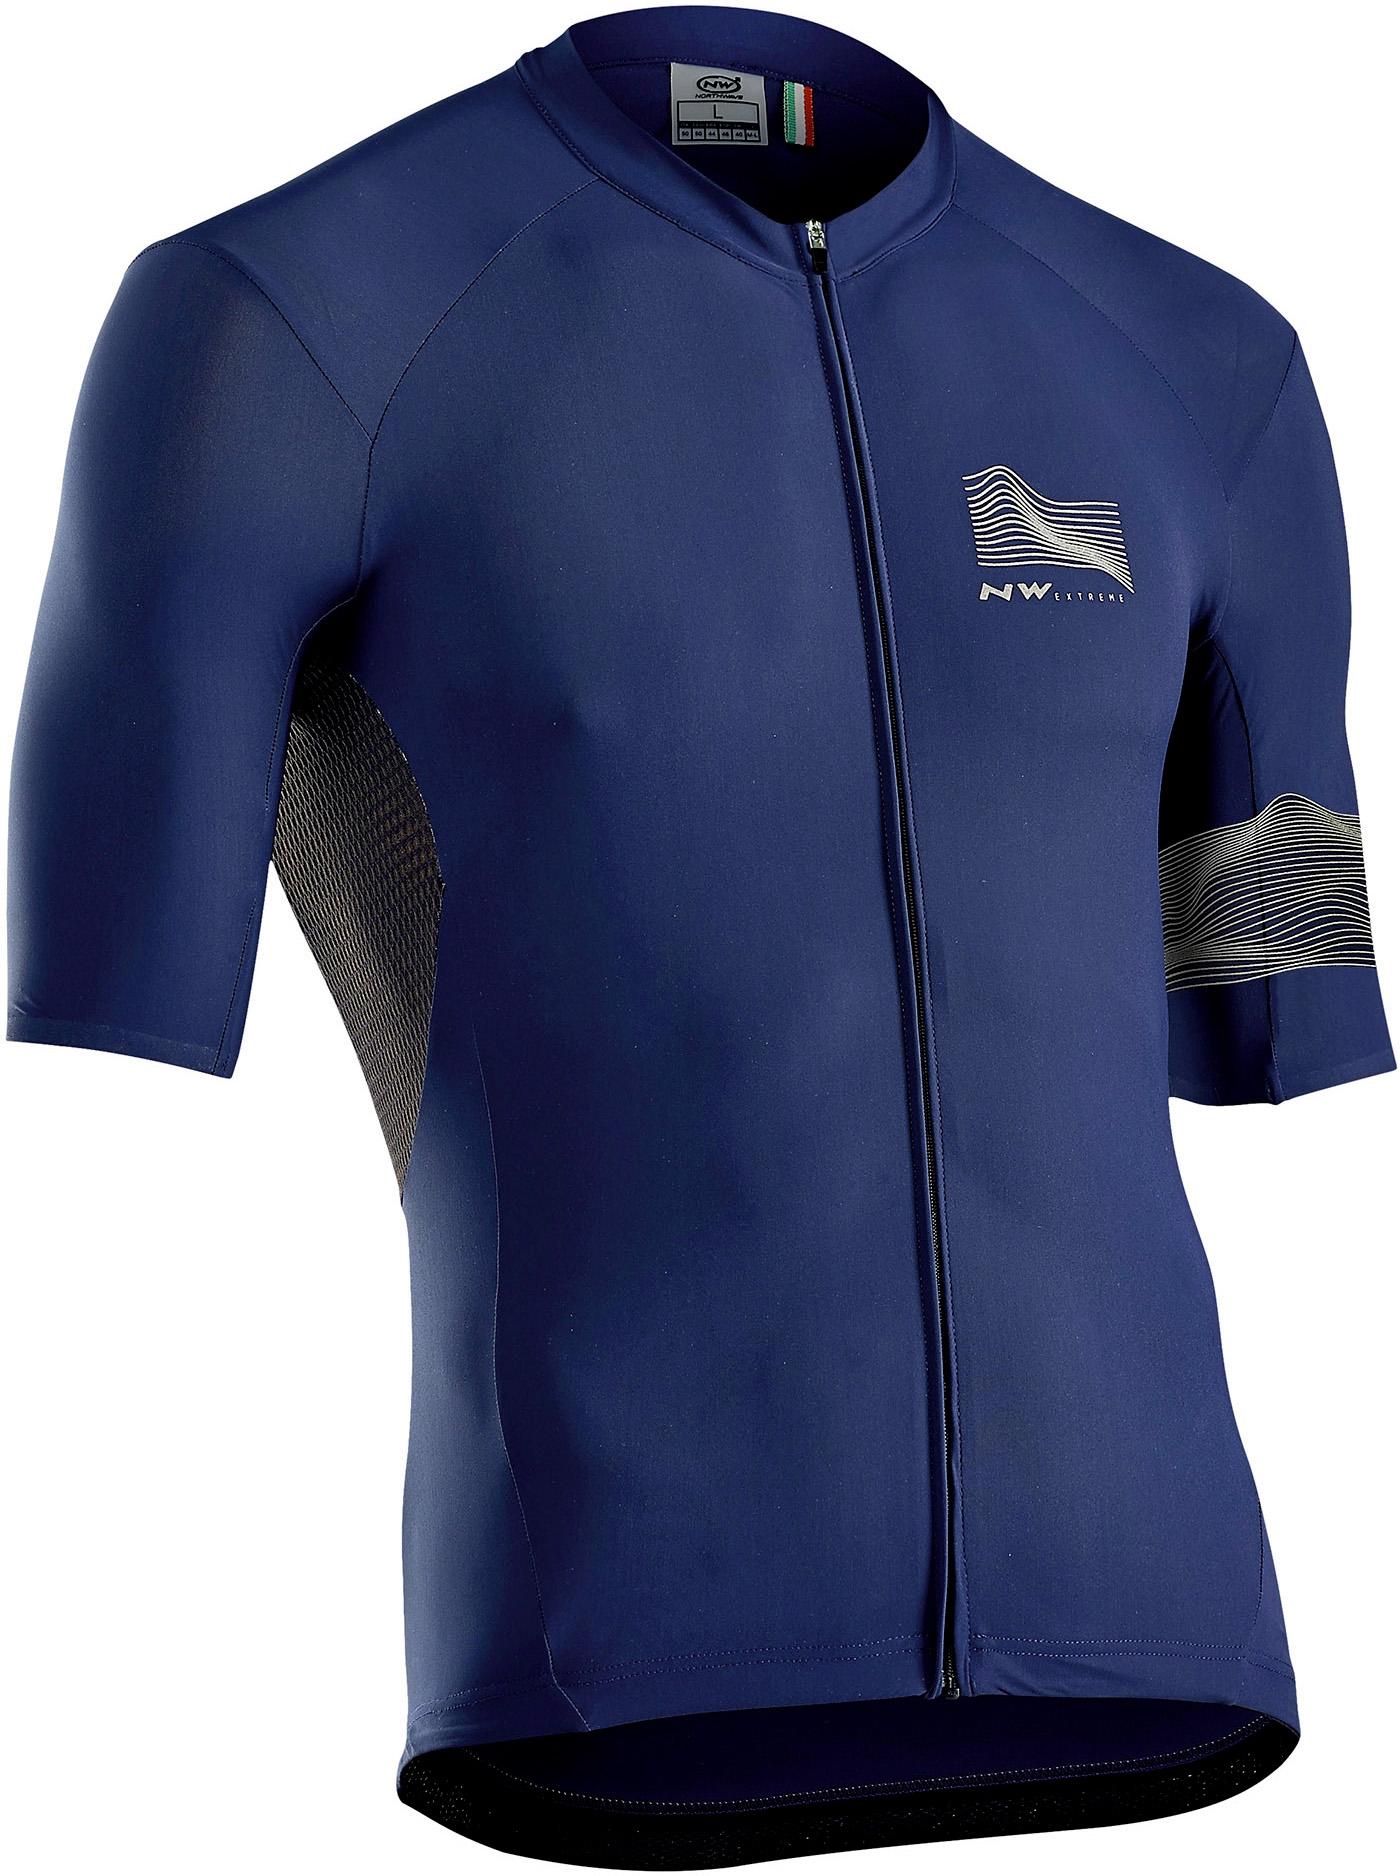 NORTHWAVE Man bike jersey short sleeves EXTREME 3 blue